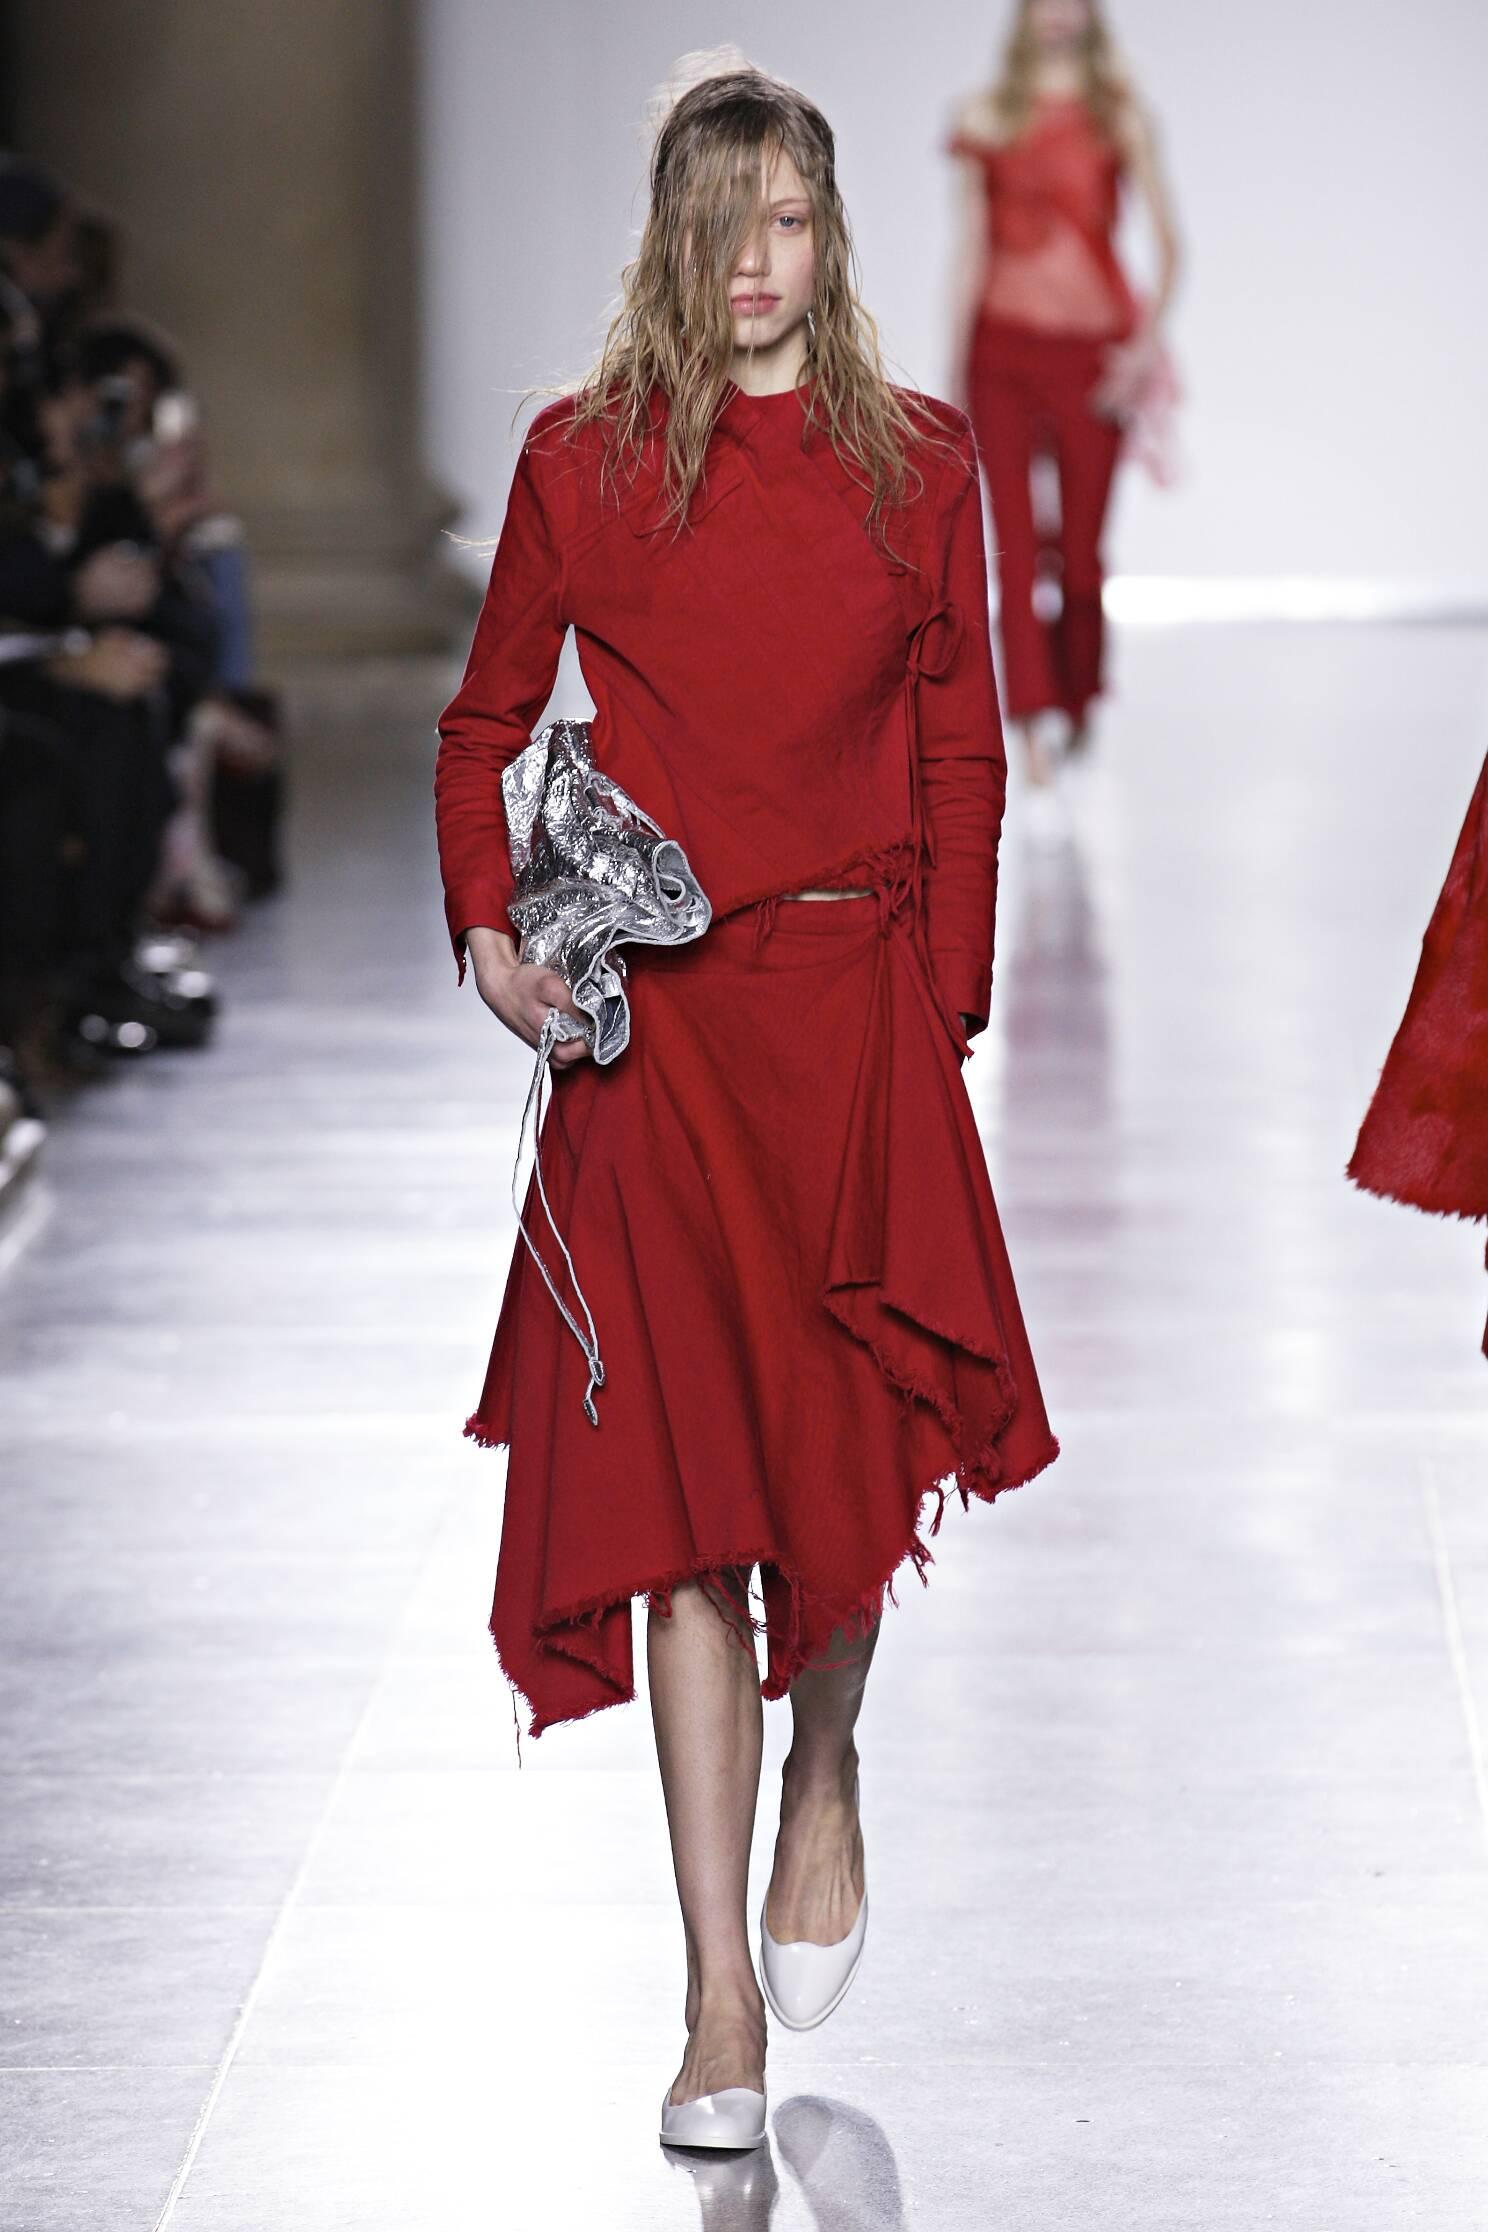 Winter 2015 Fashion Show Marques Almeida Collection